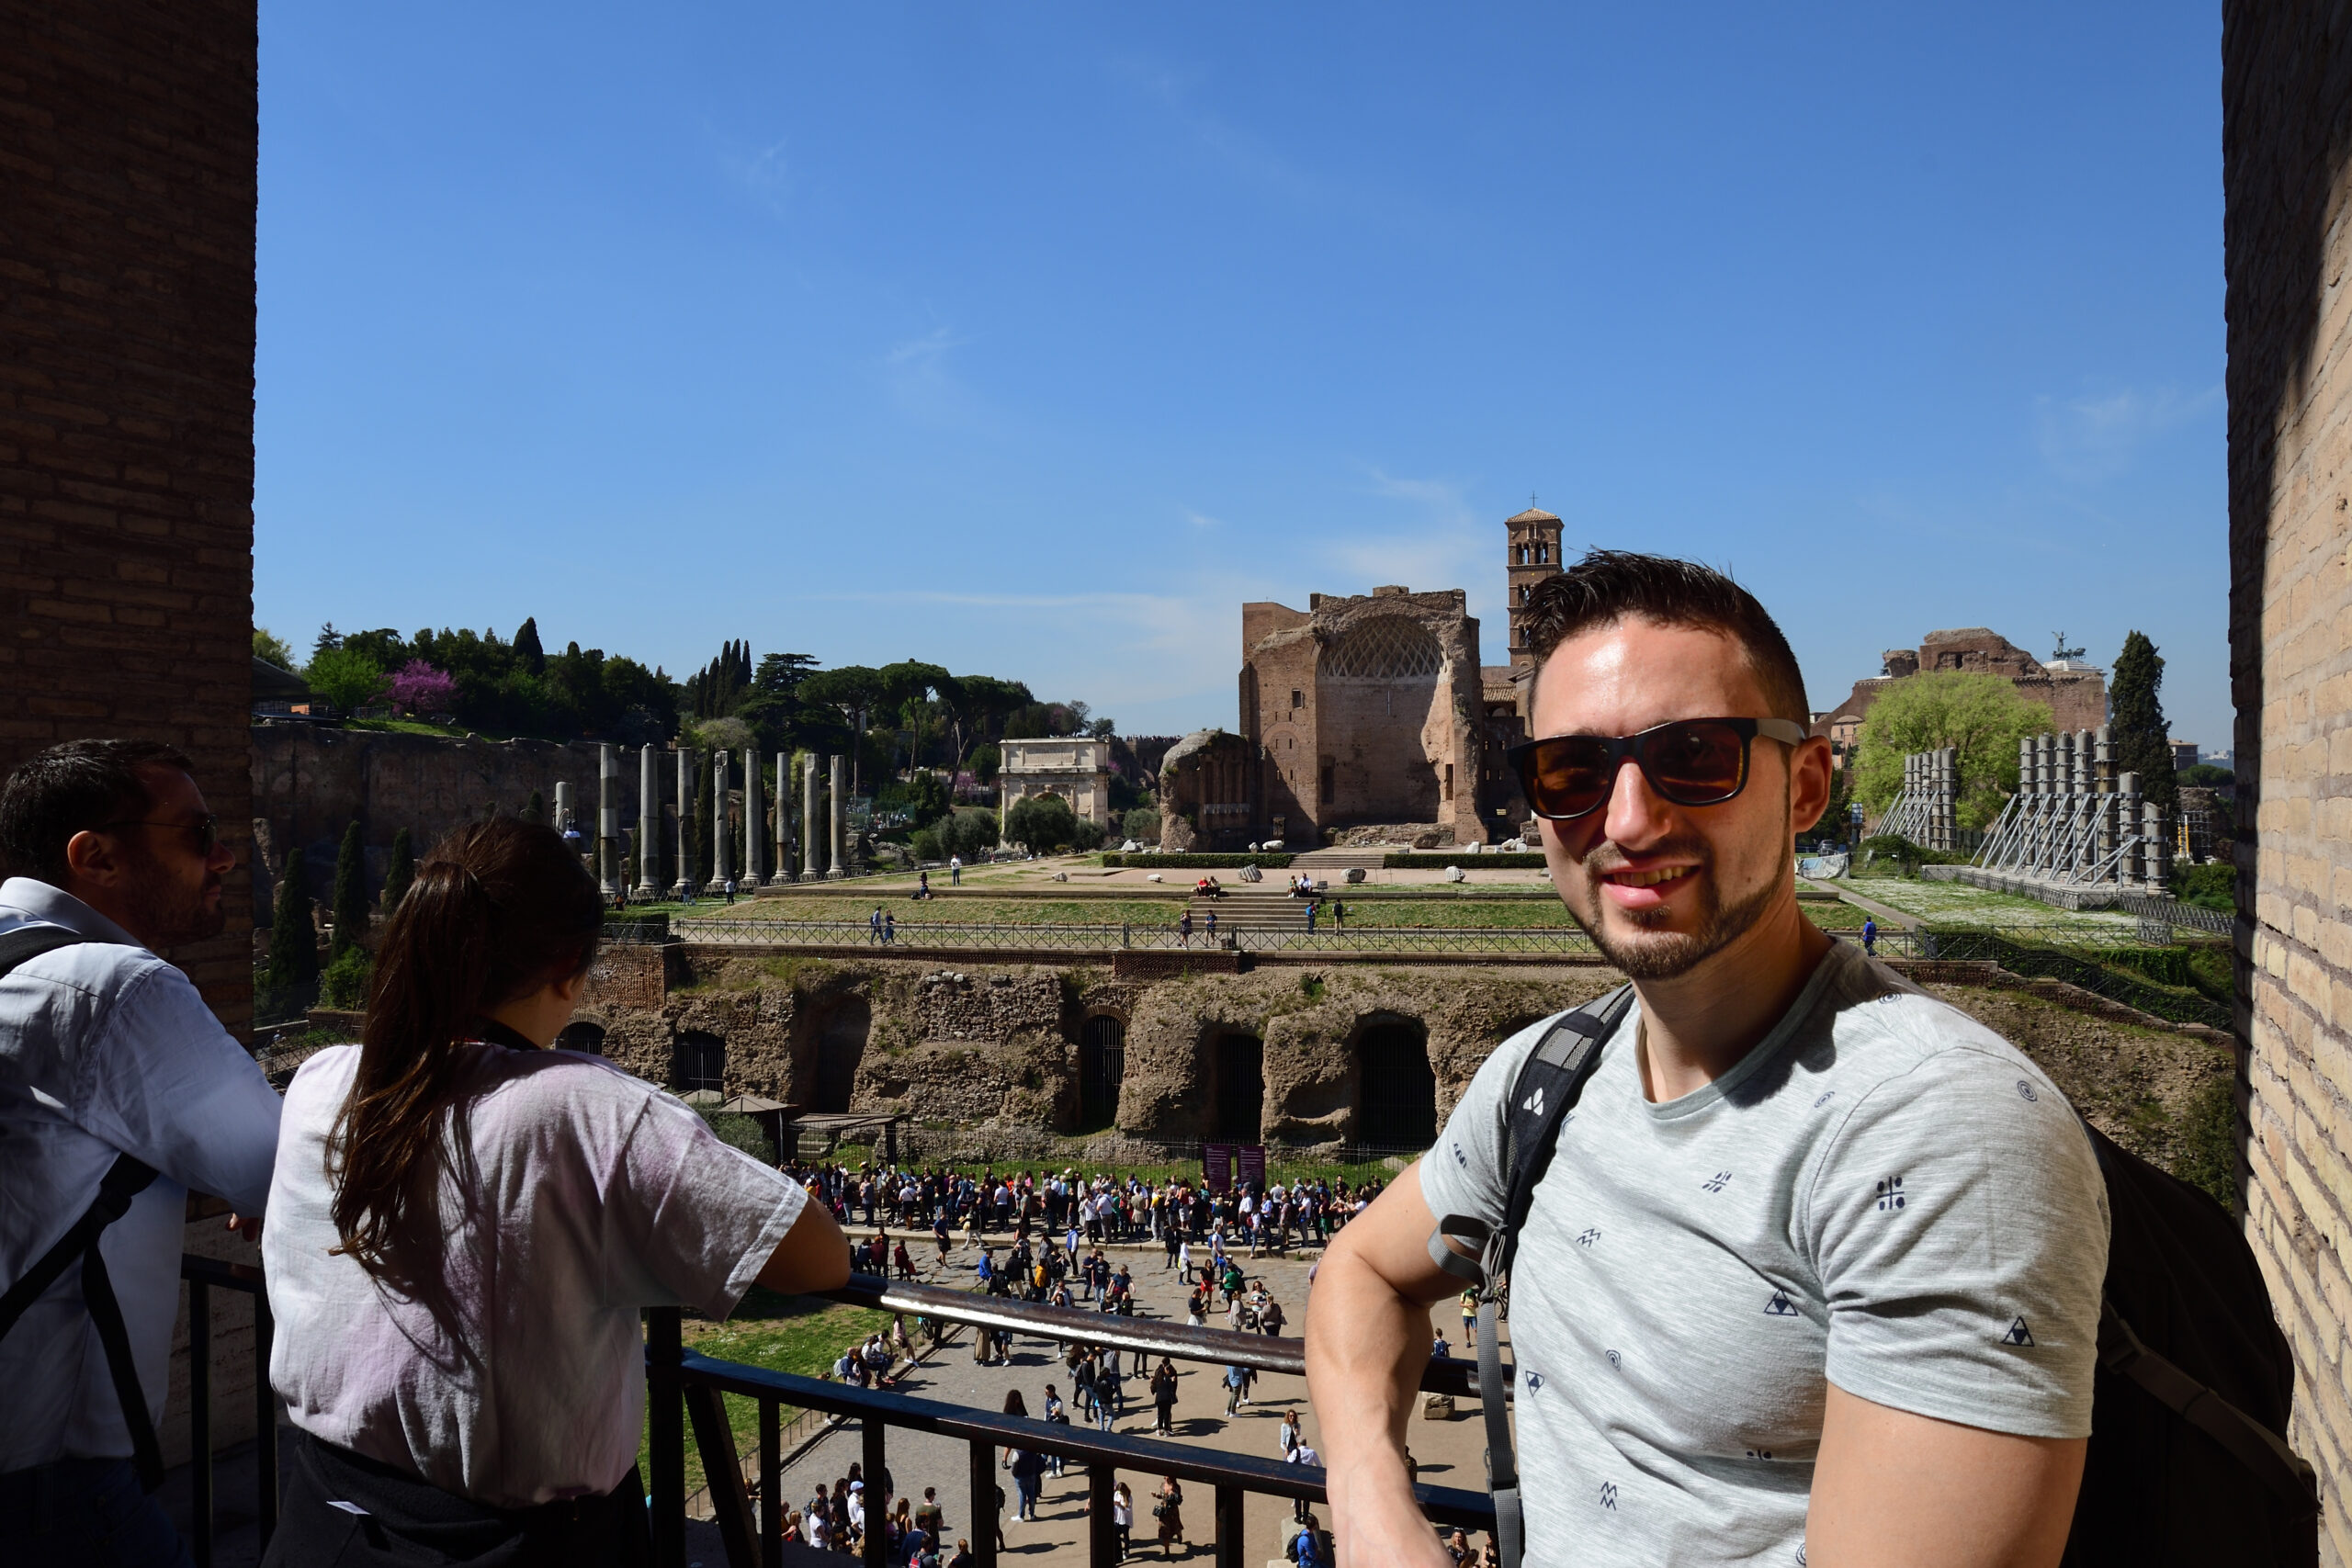 Overtoerisme in Italië - Rome - Colosseum